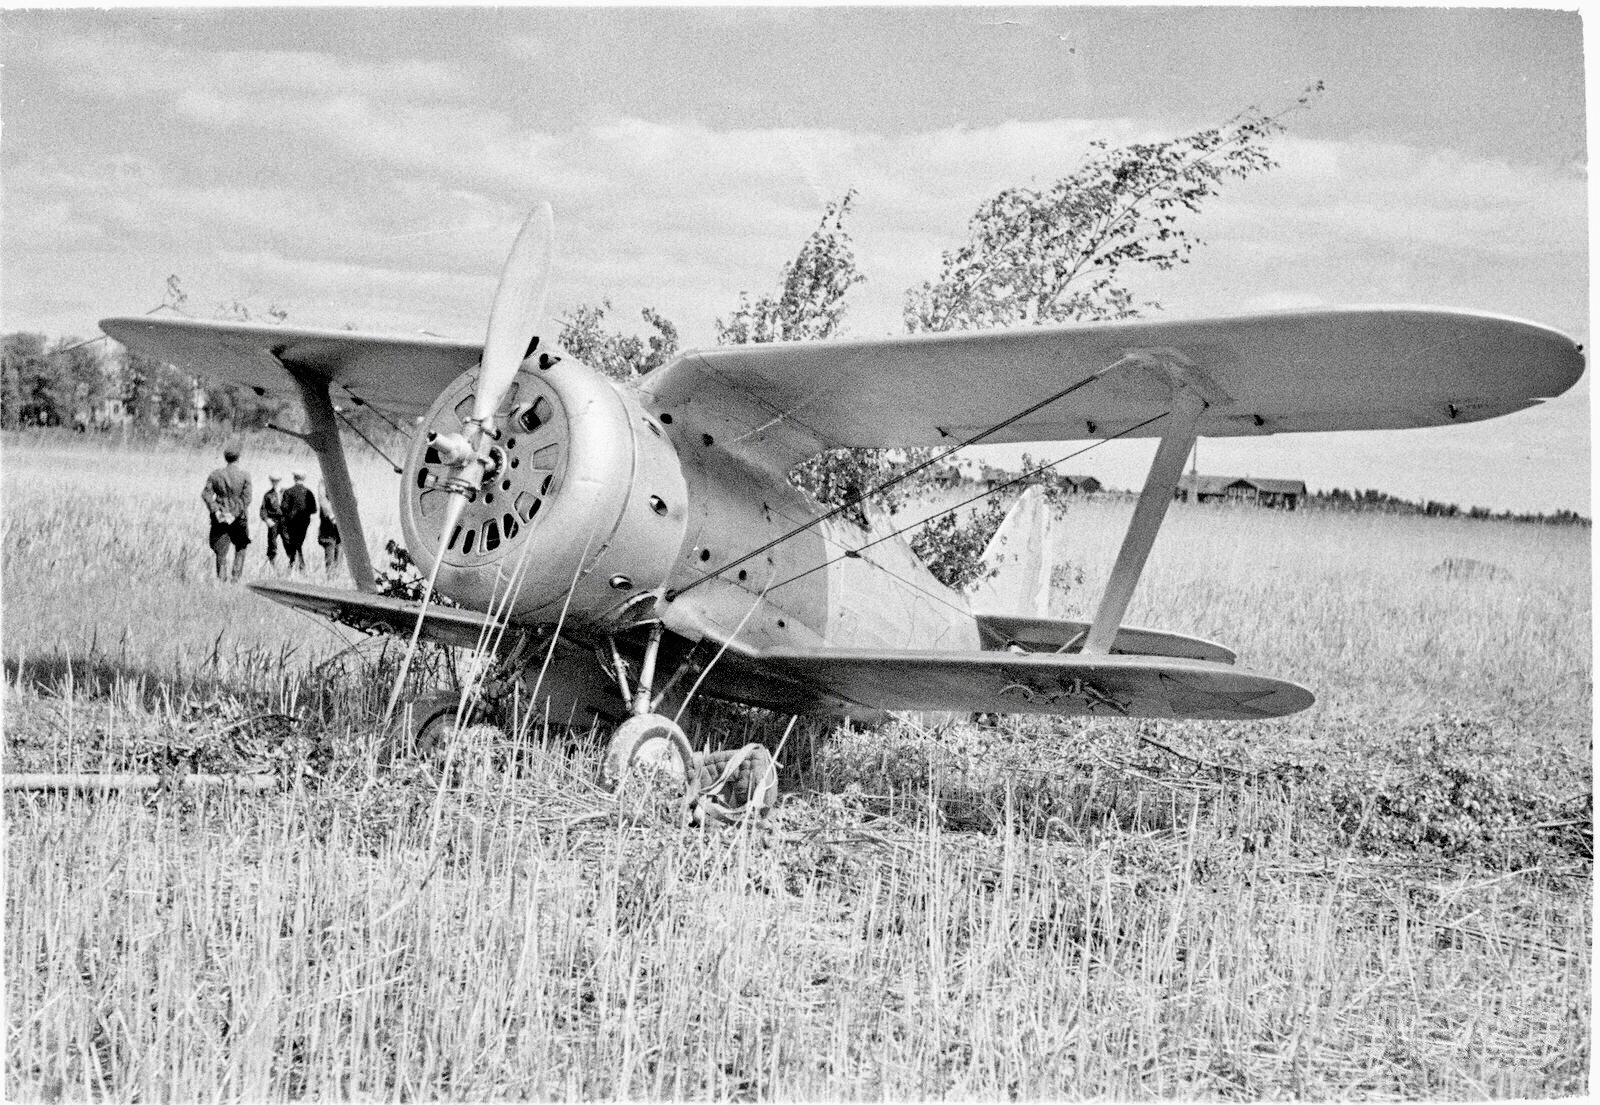 Файл:Polikarpov I-153 SA-kuva 20616.jpg